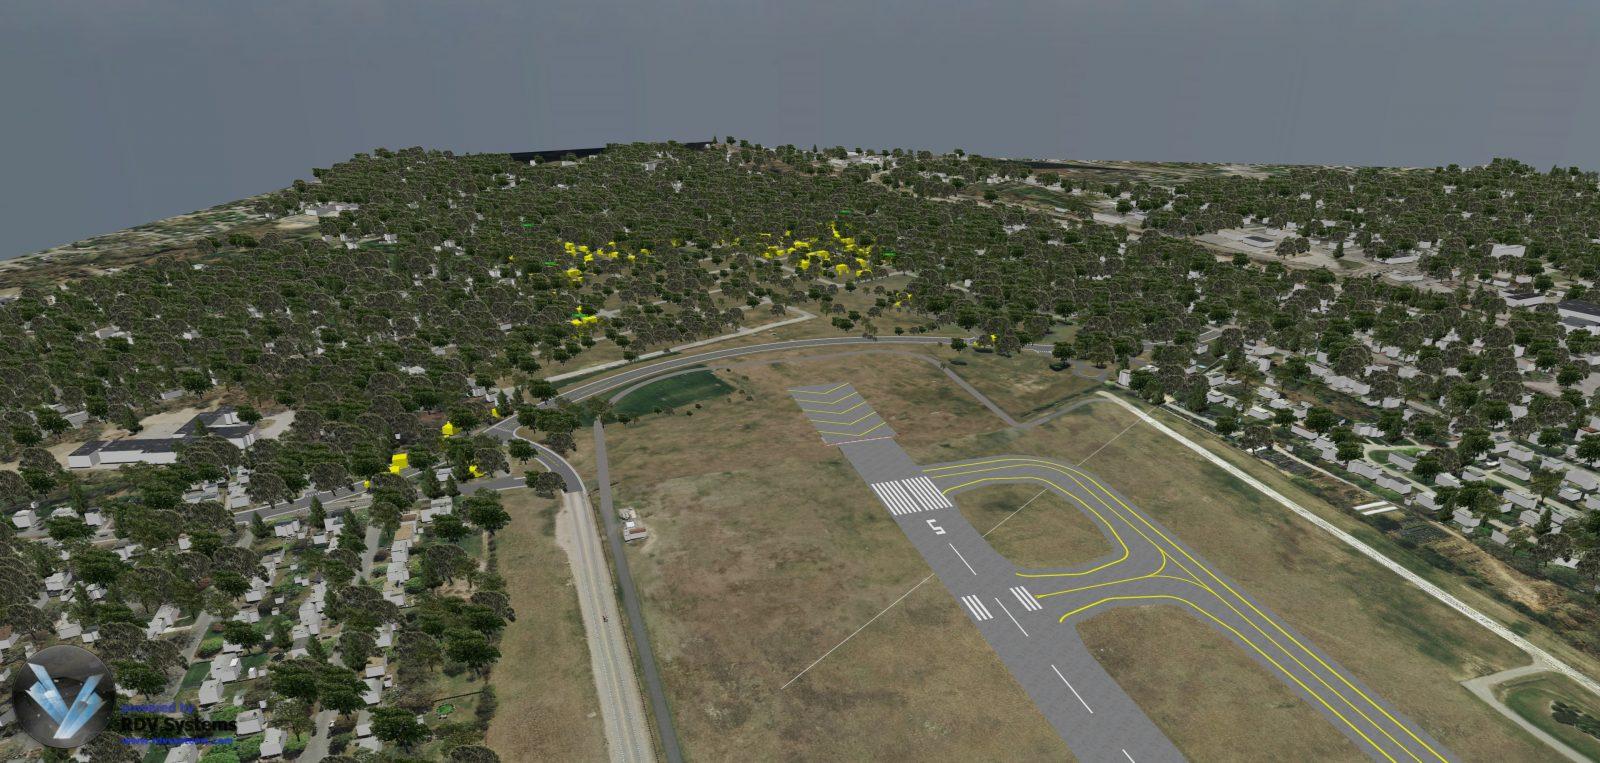 RDV Systems - TF Green Airport 3